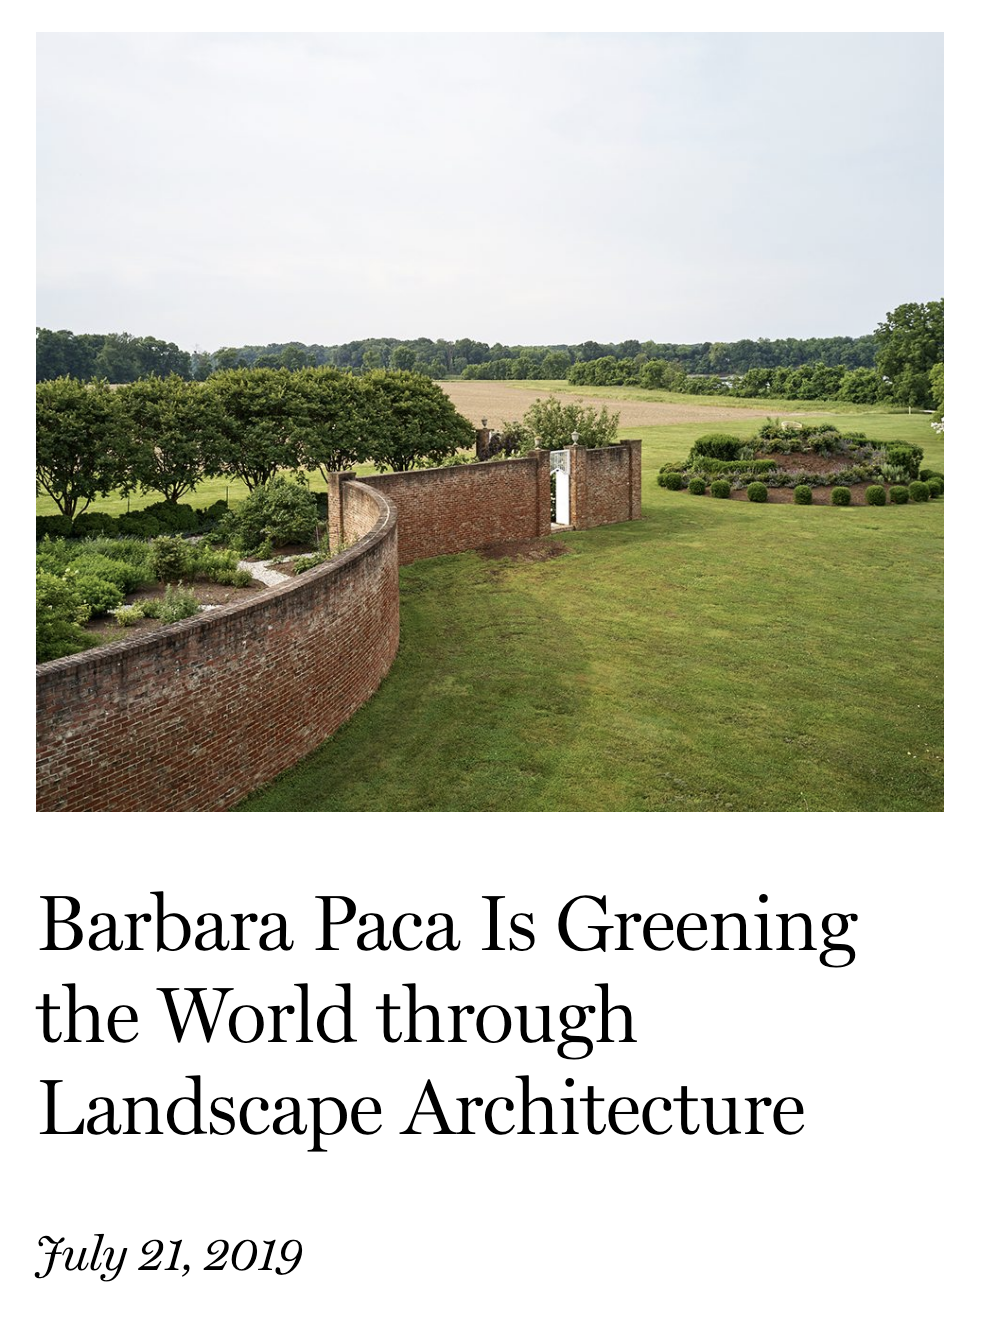 Barbara Paca is Greening the World through Landscape Architecture